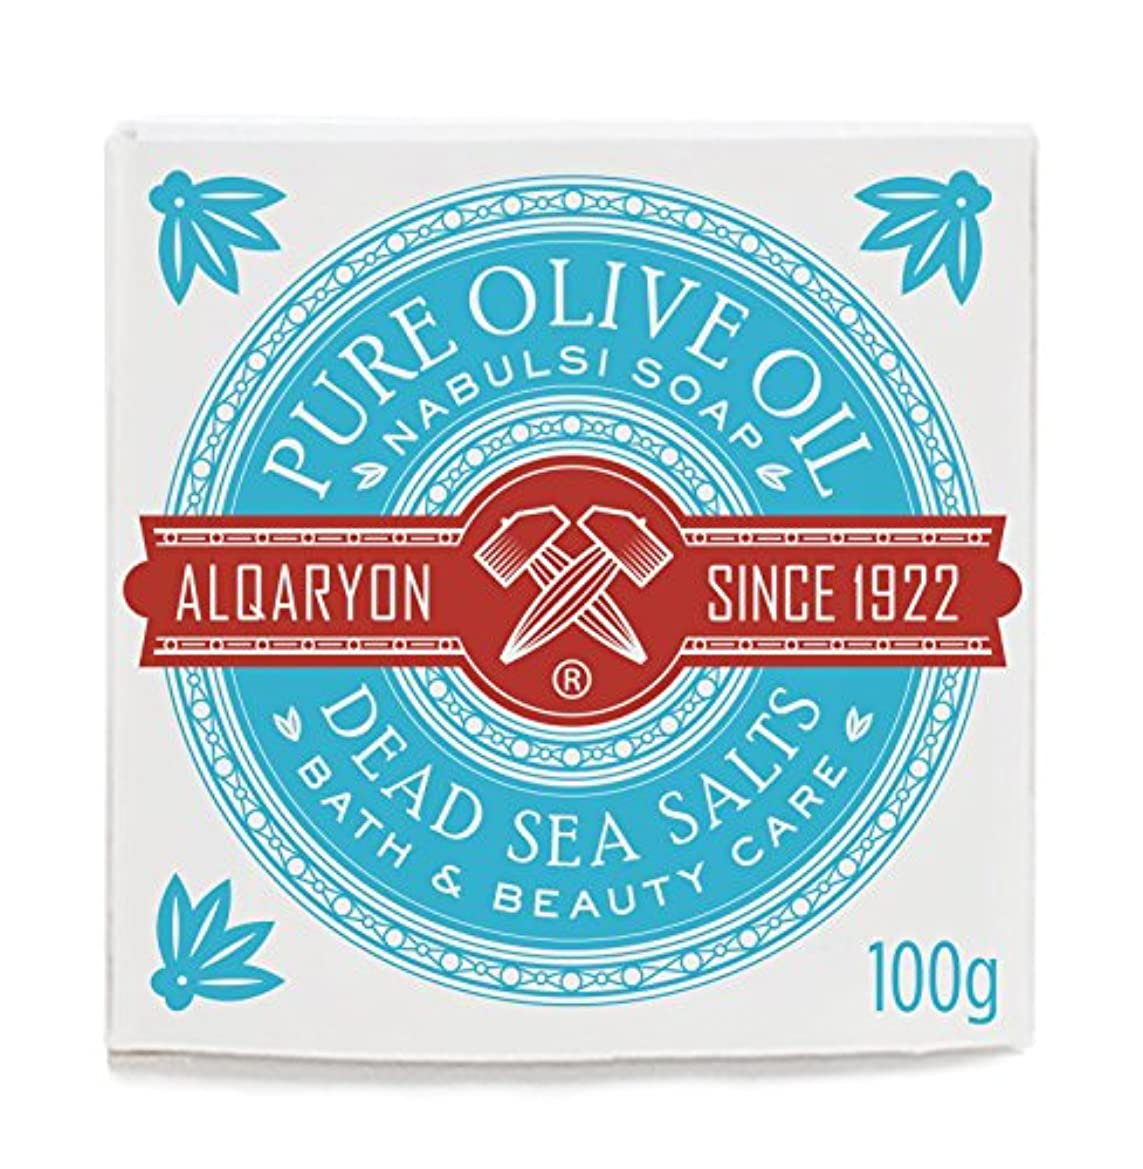 Alqaryon Dead Sea Salts & Olive Oil Bar Soap, Pack of 4 Bars 100g- Alqaryonの死海で取れる塩&オリーブオイル ソープ、バス & ビューティー ケア...